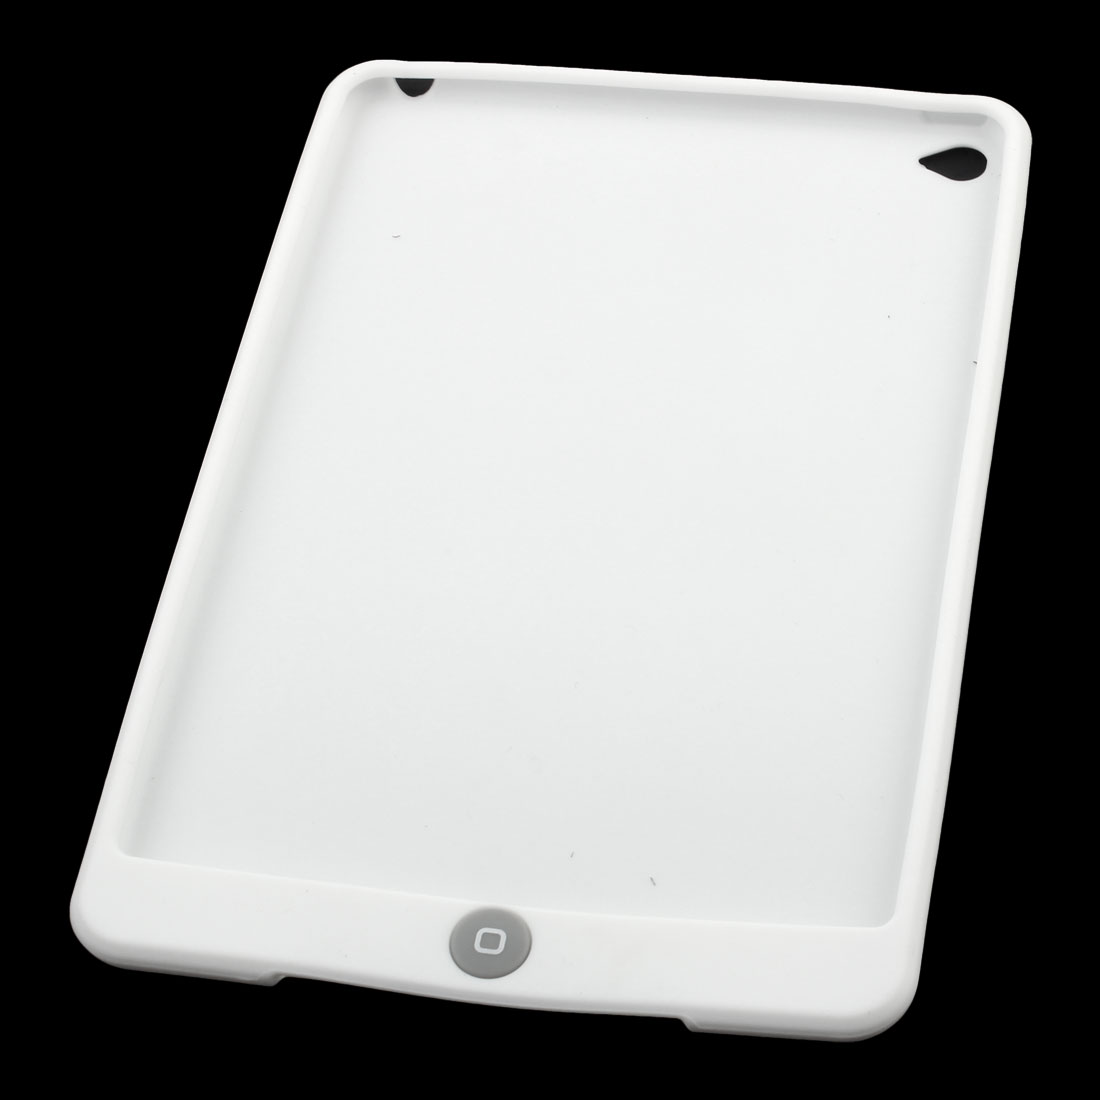 Unique BargainsRubber Protective Skin Back Cover Case White for iPad Mini 4 - image 4 of 7